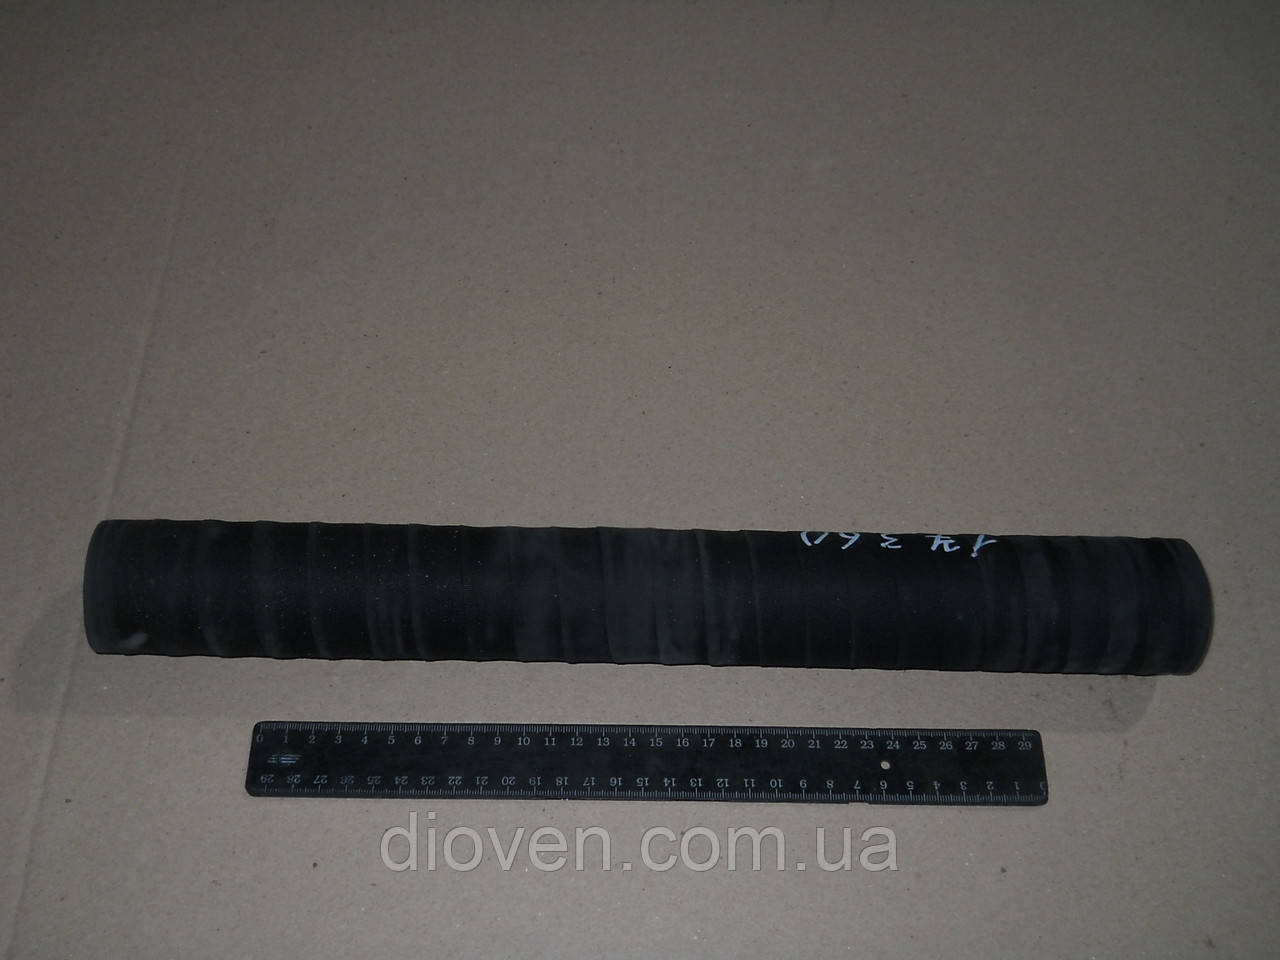 Патрубок радиатора МАЗ верхний (пр-во Россия) (Арт. 500-1303010)